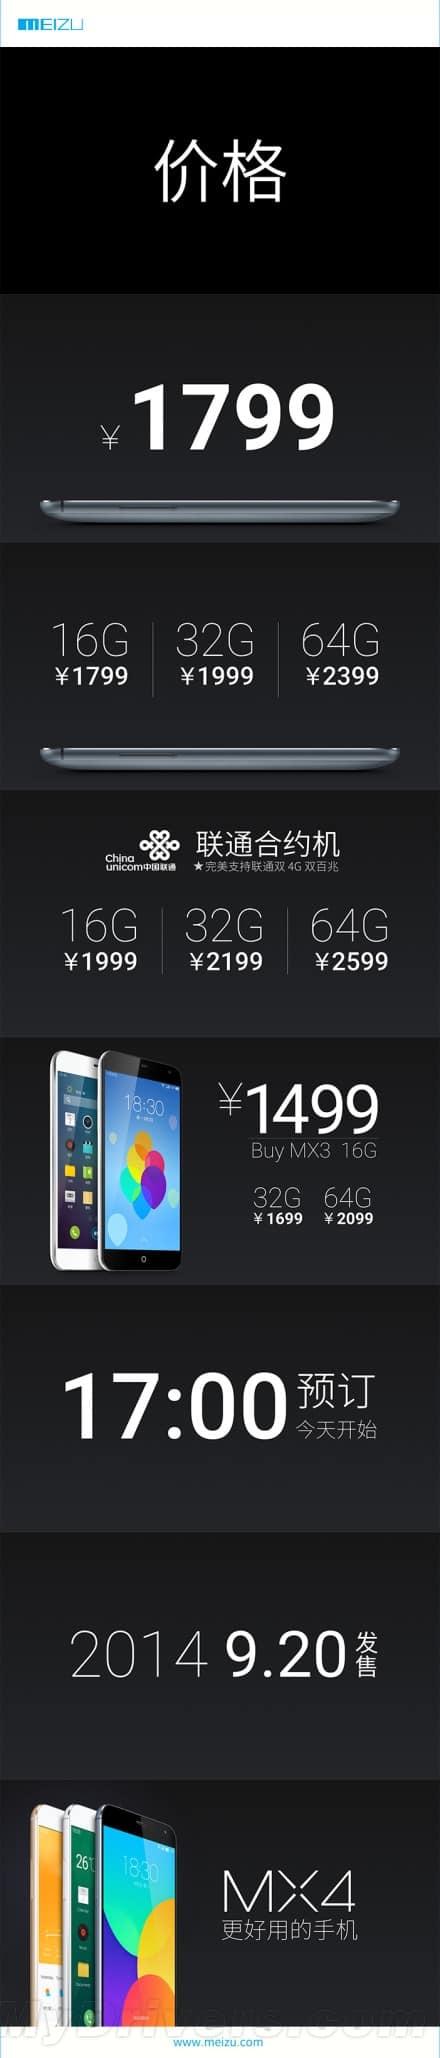 Meizu Mx4 1.10